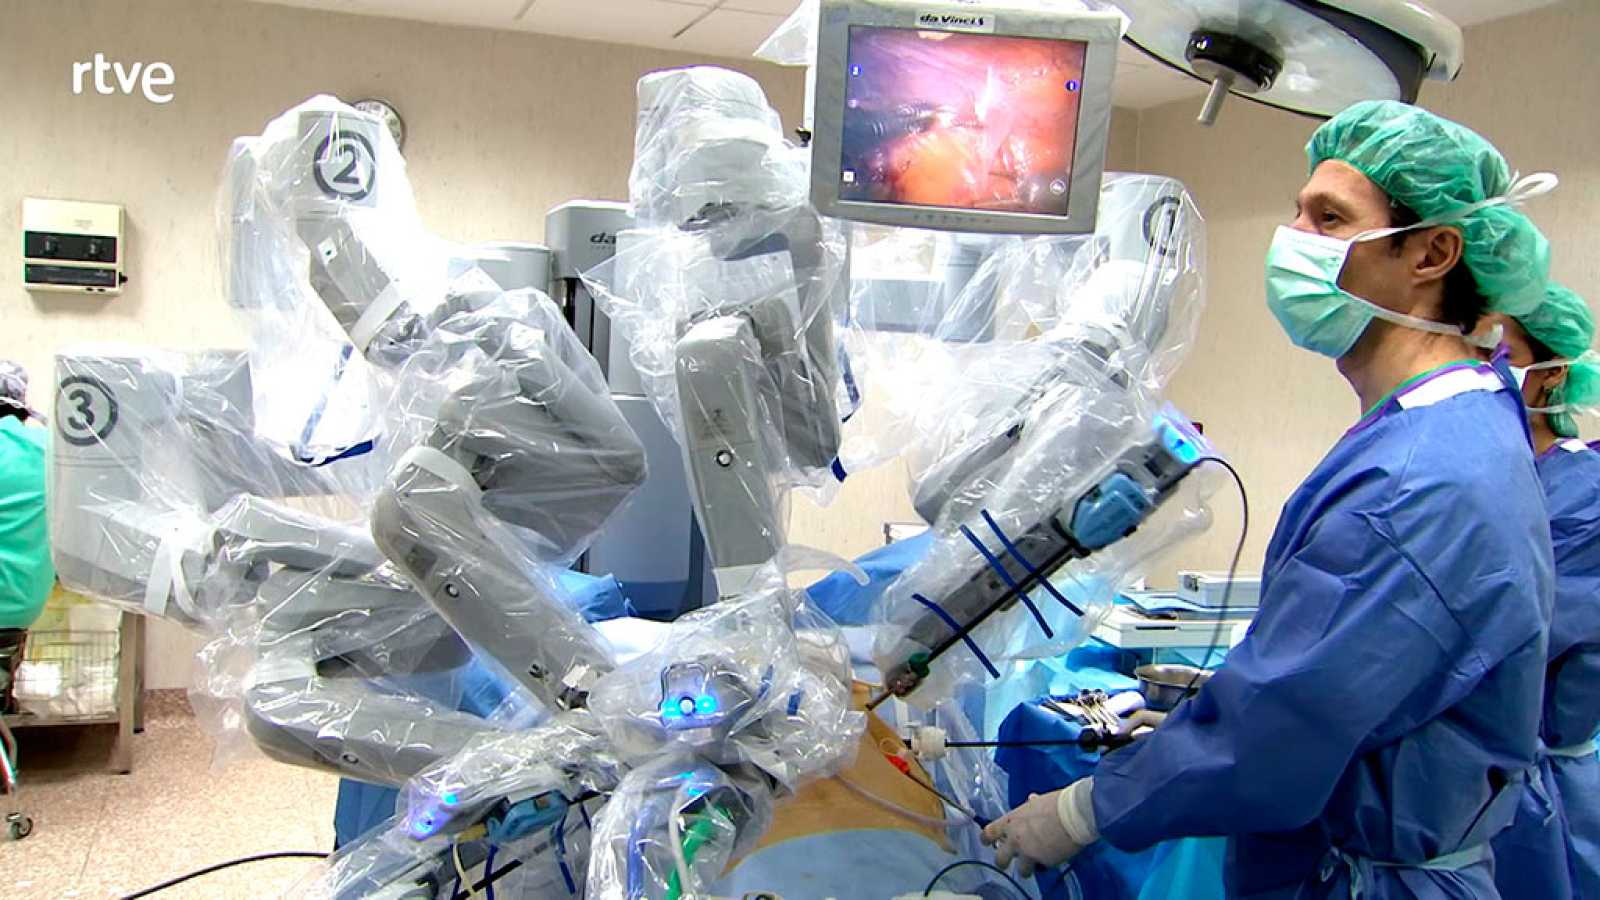 operación de tumor de próstata con robot en